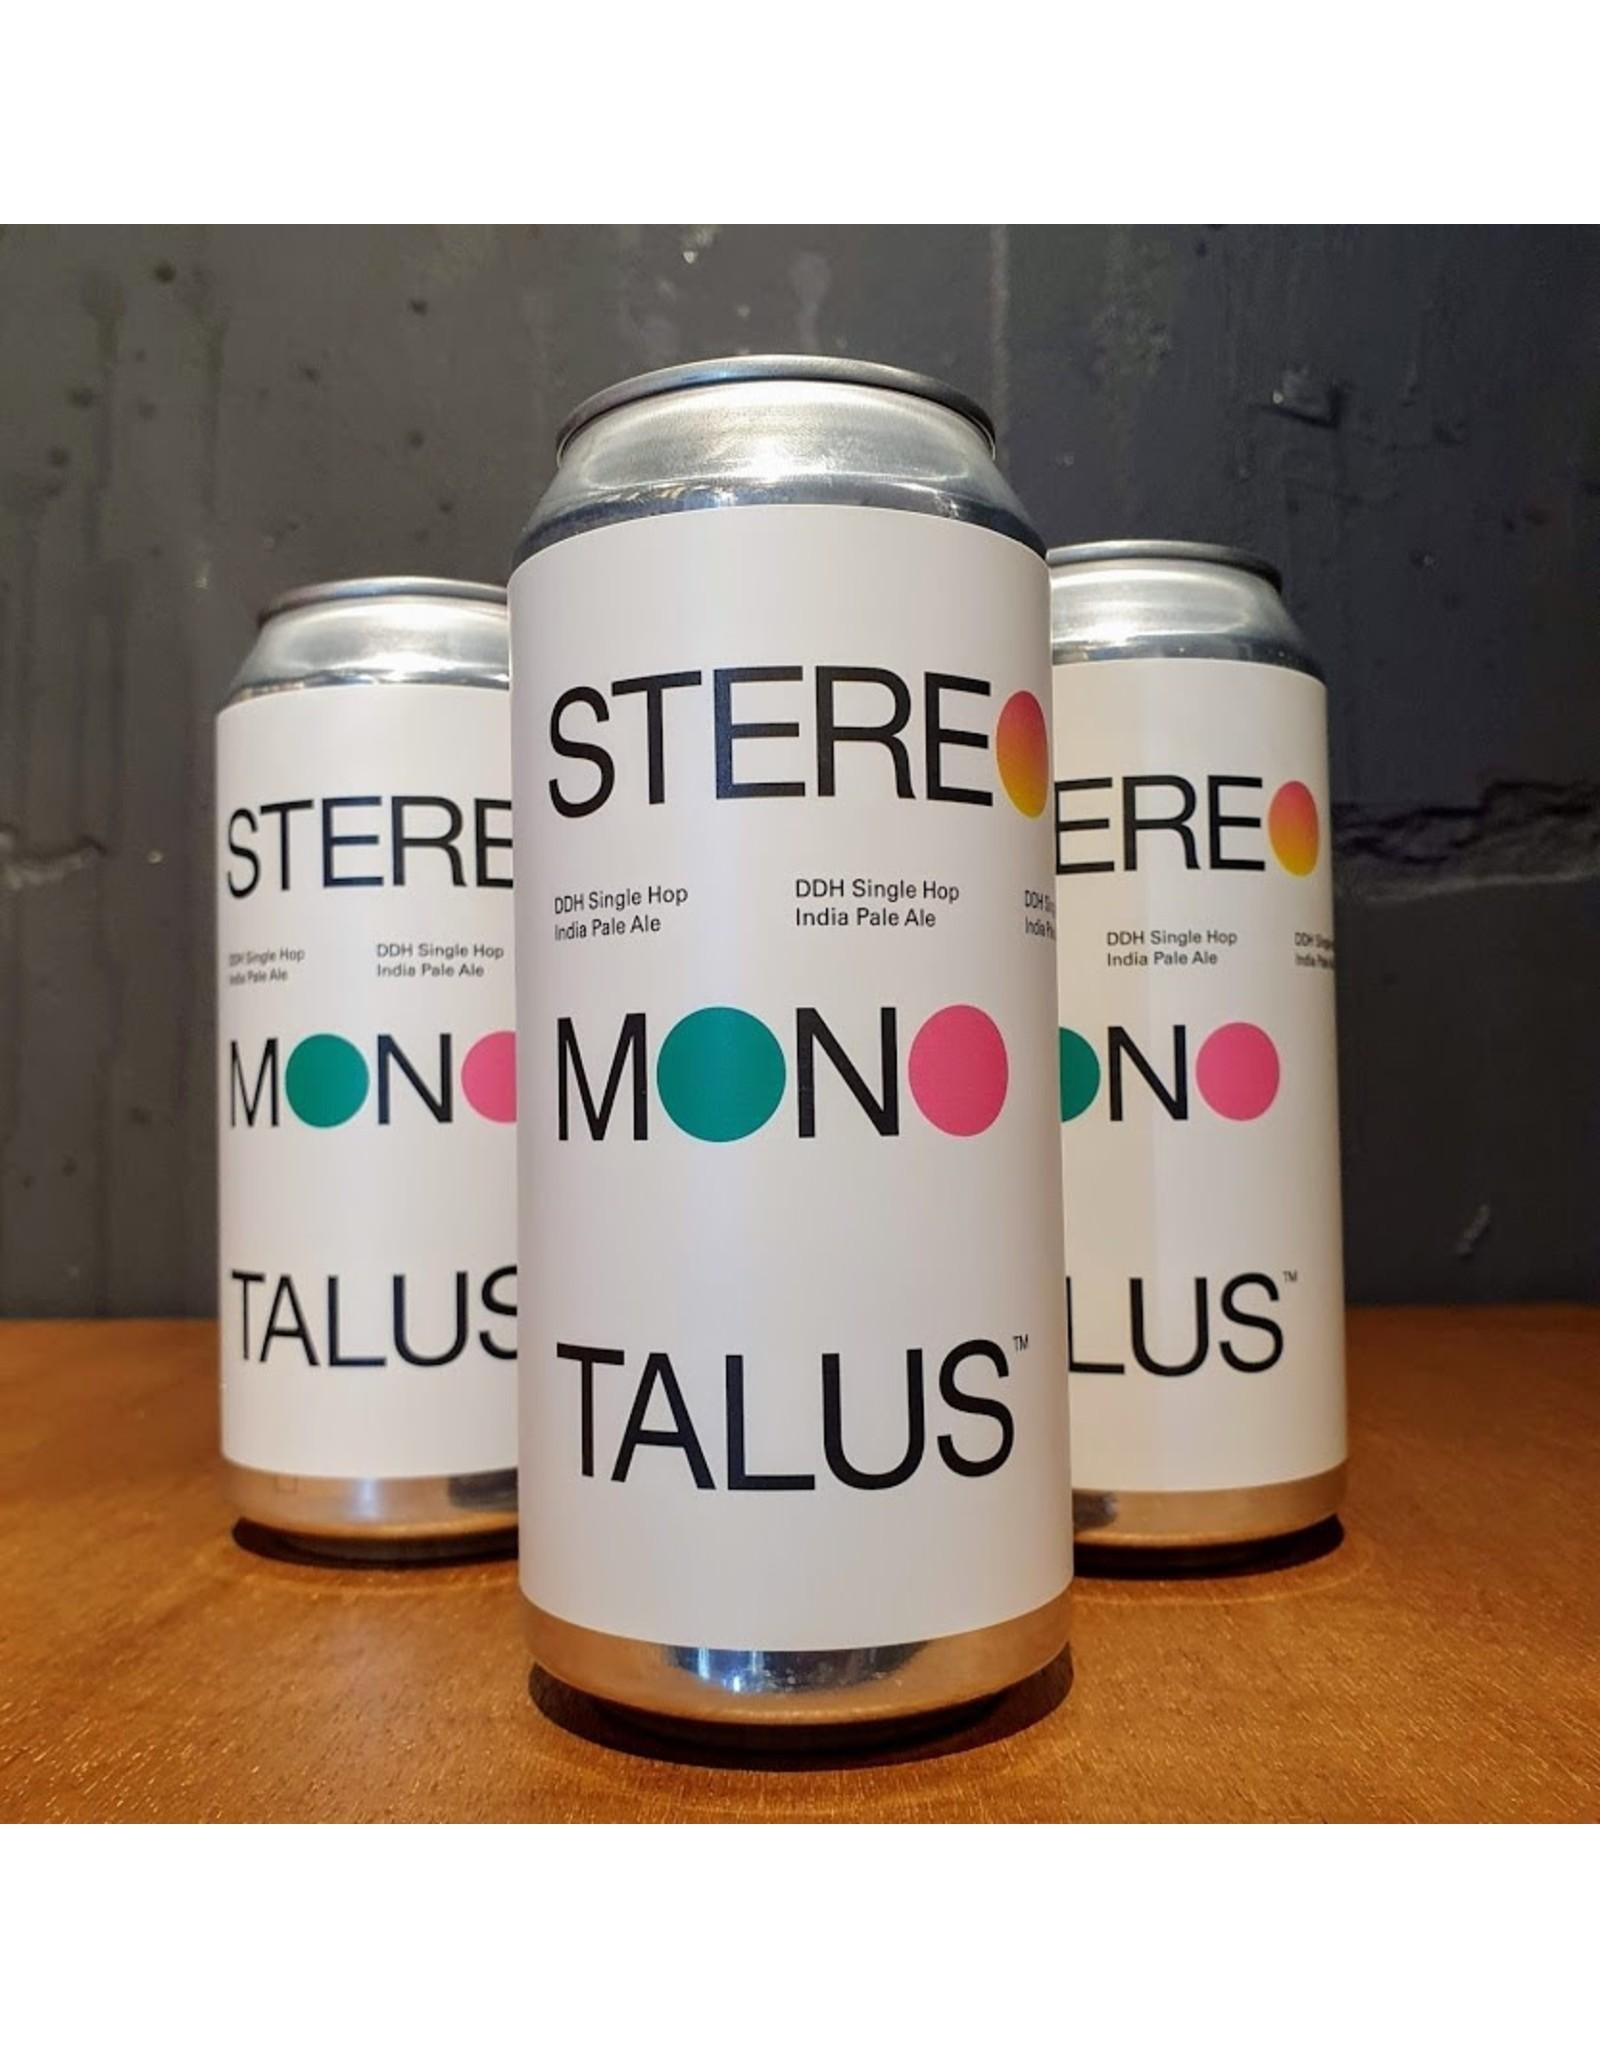 To Øl: Stereo Mono Talus